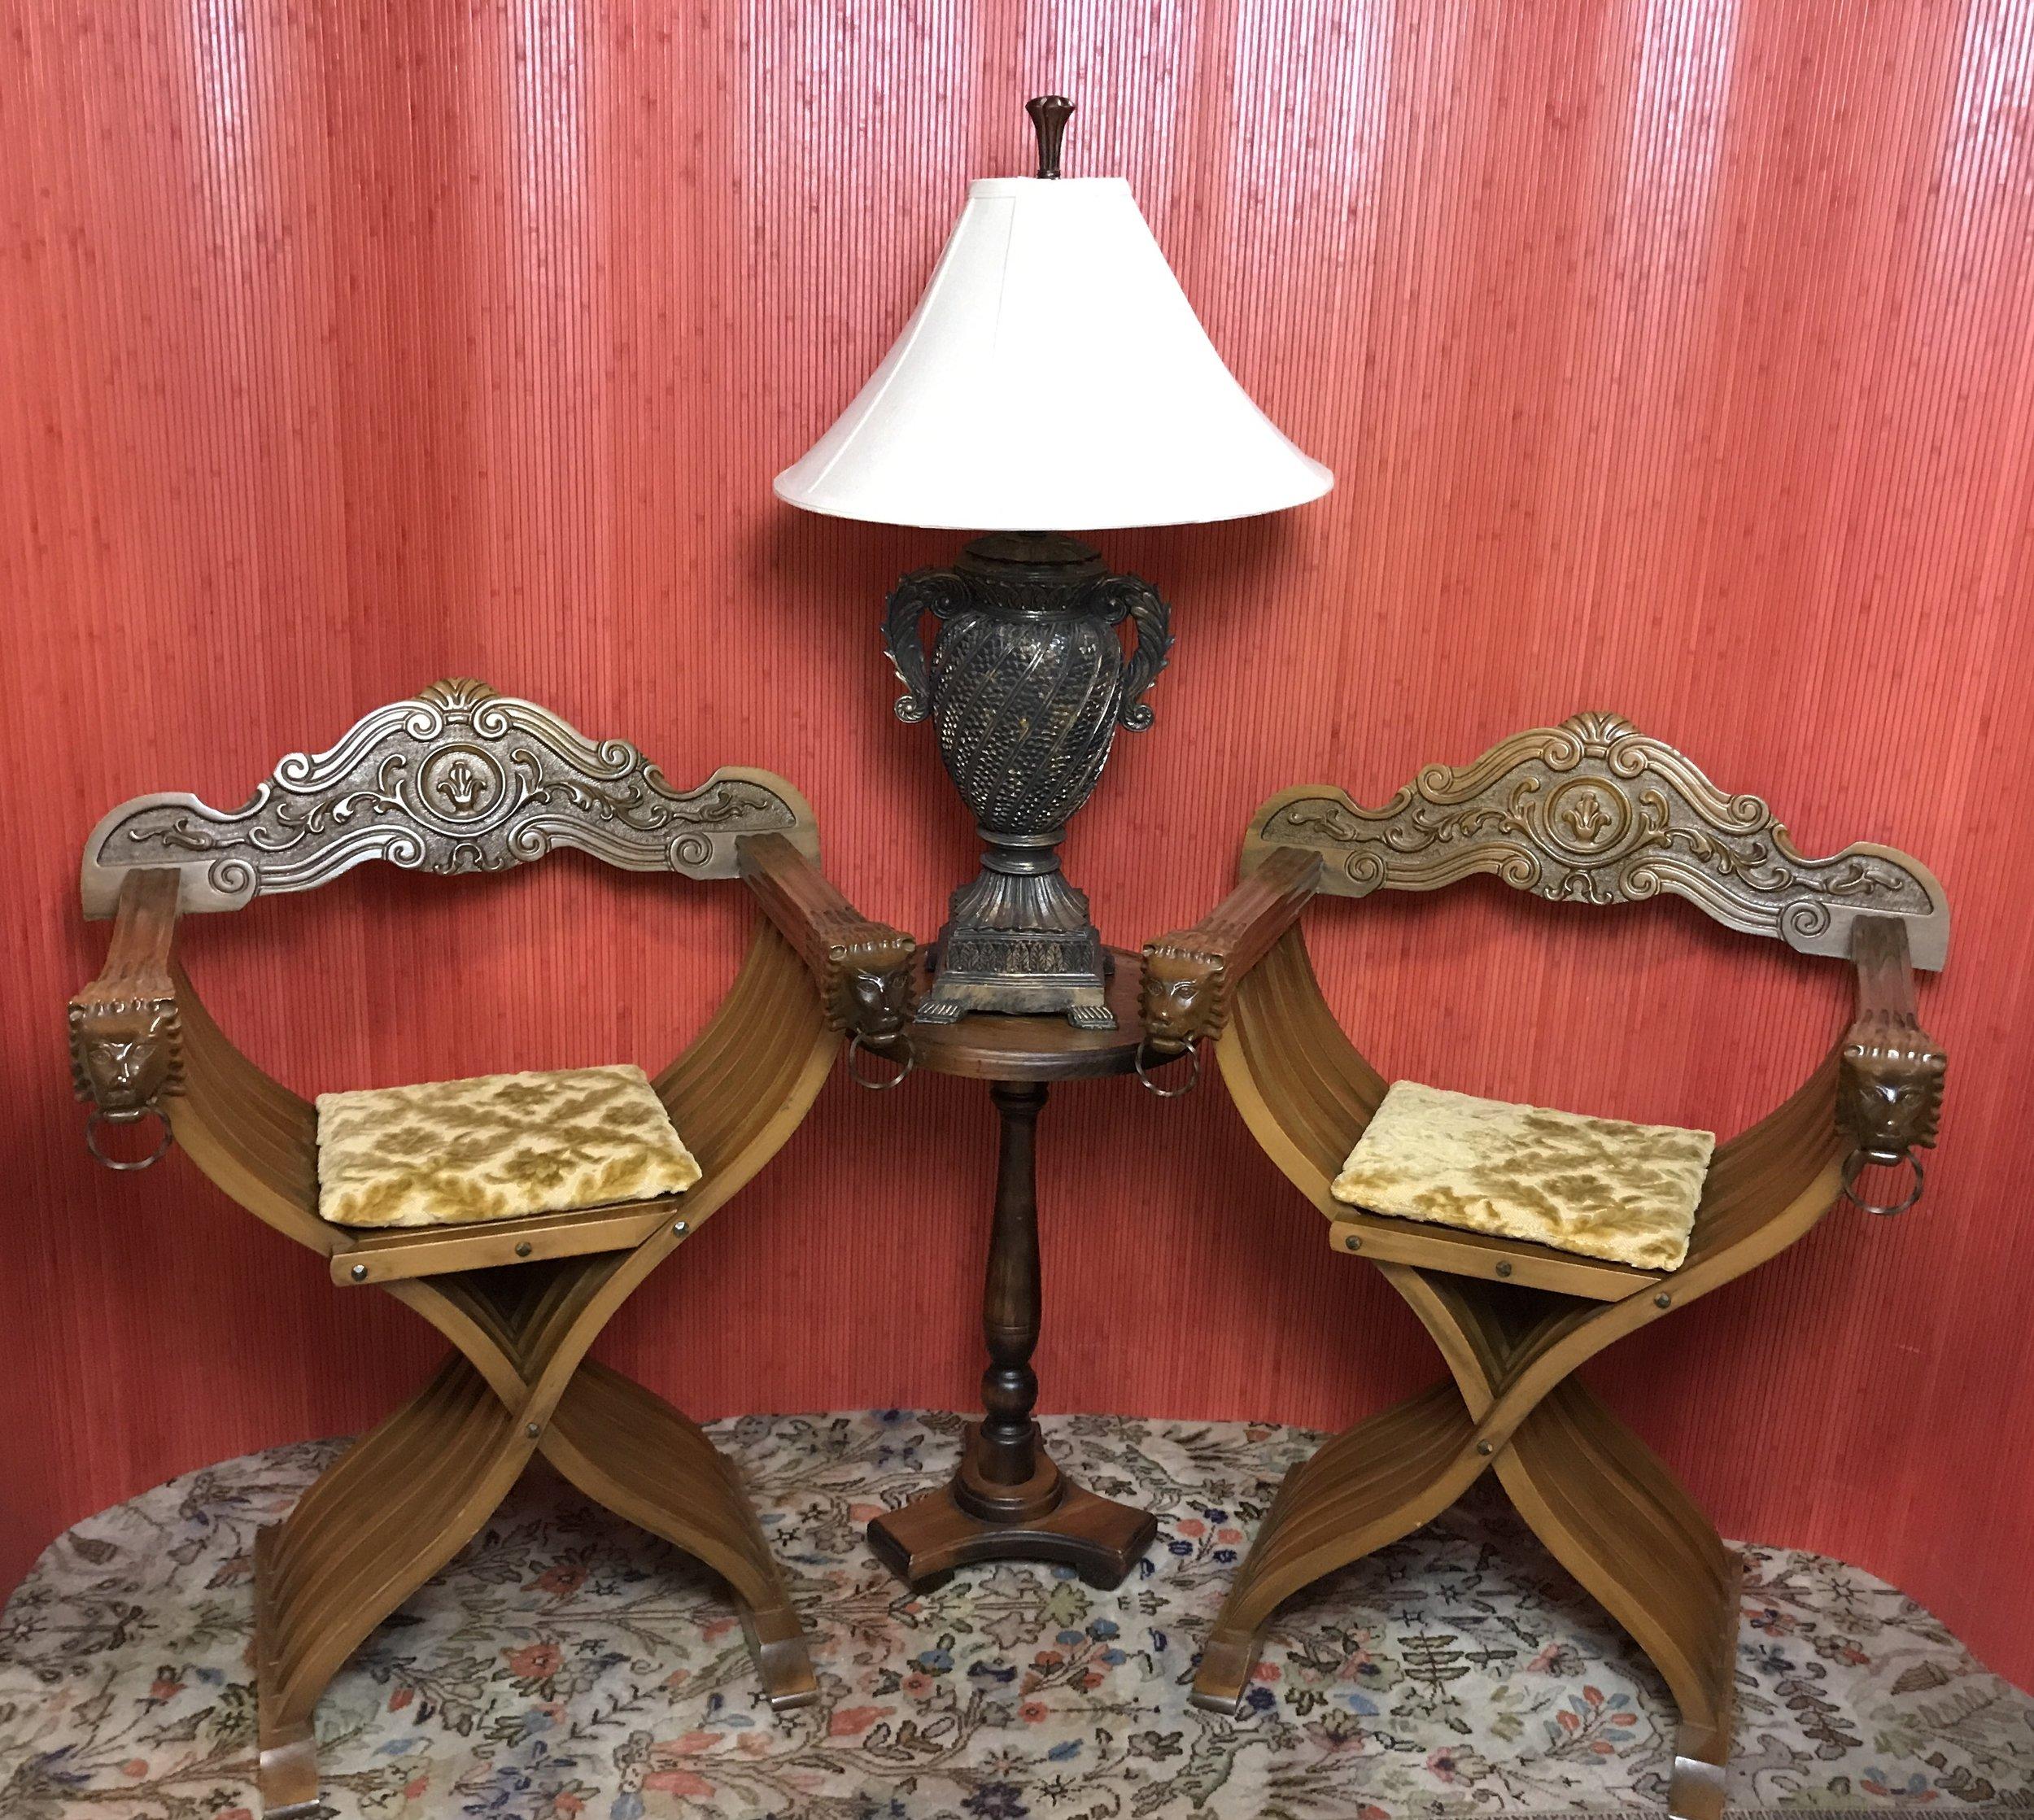 Folding Savonarola Chairs $399.95 C0938  -   19000